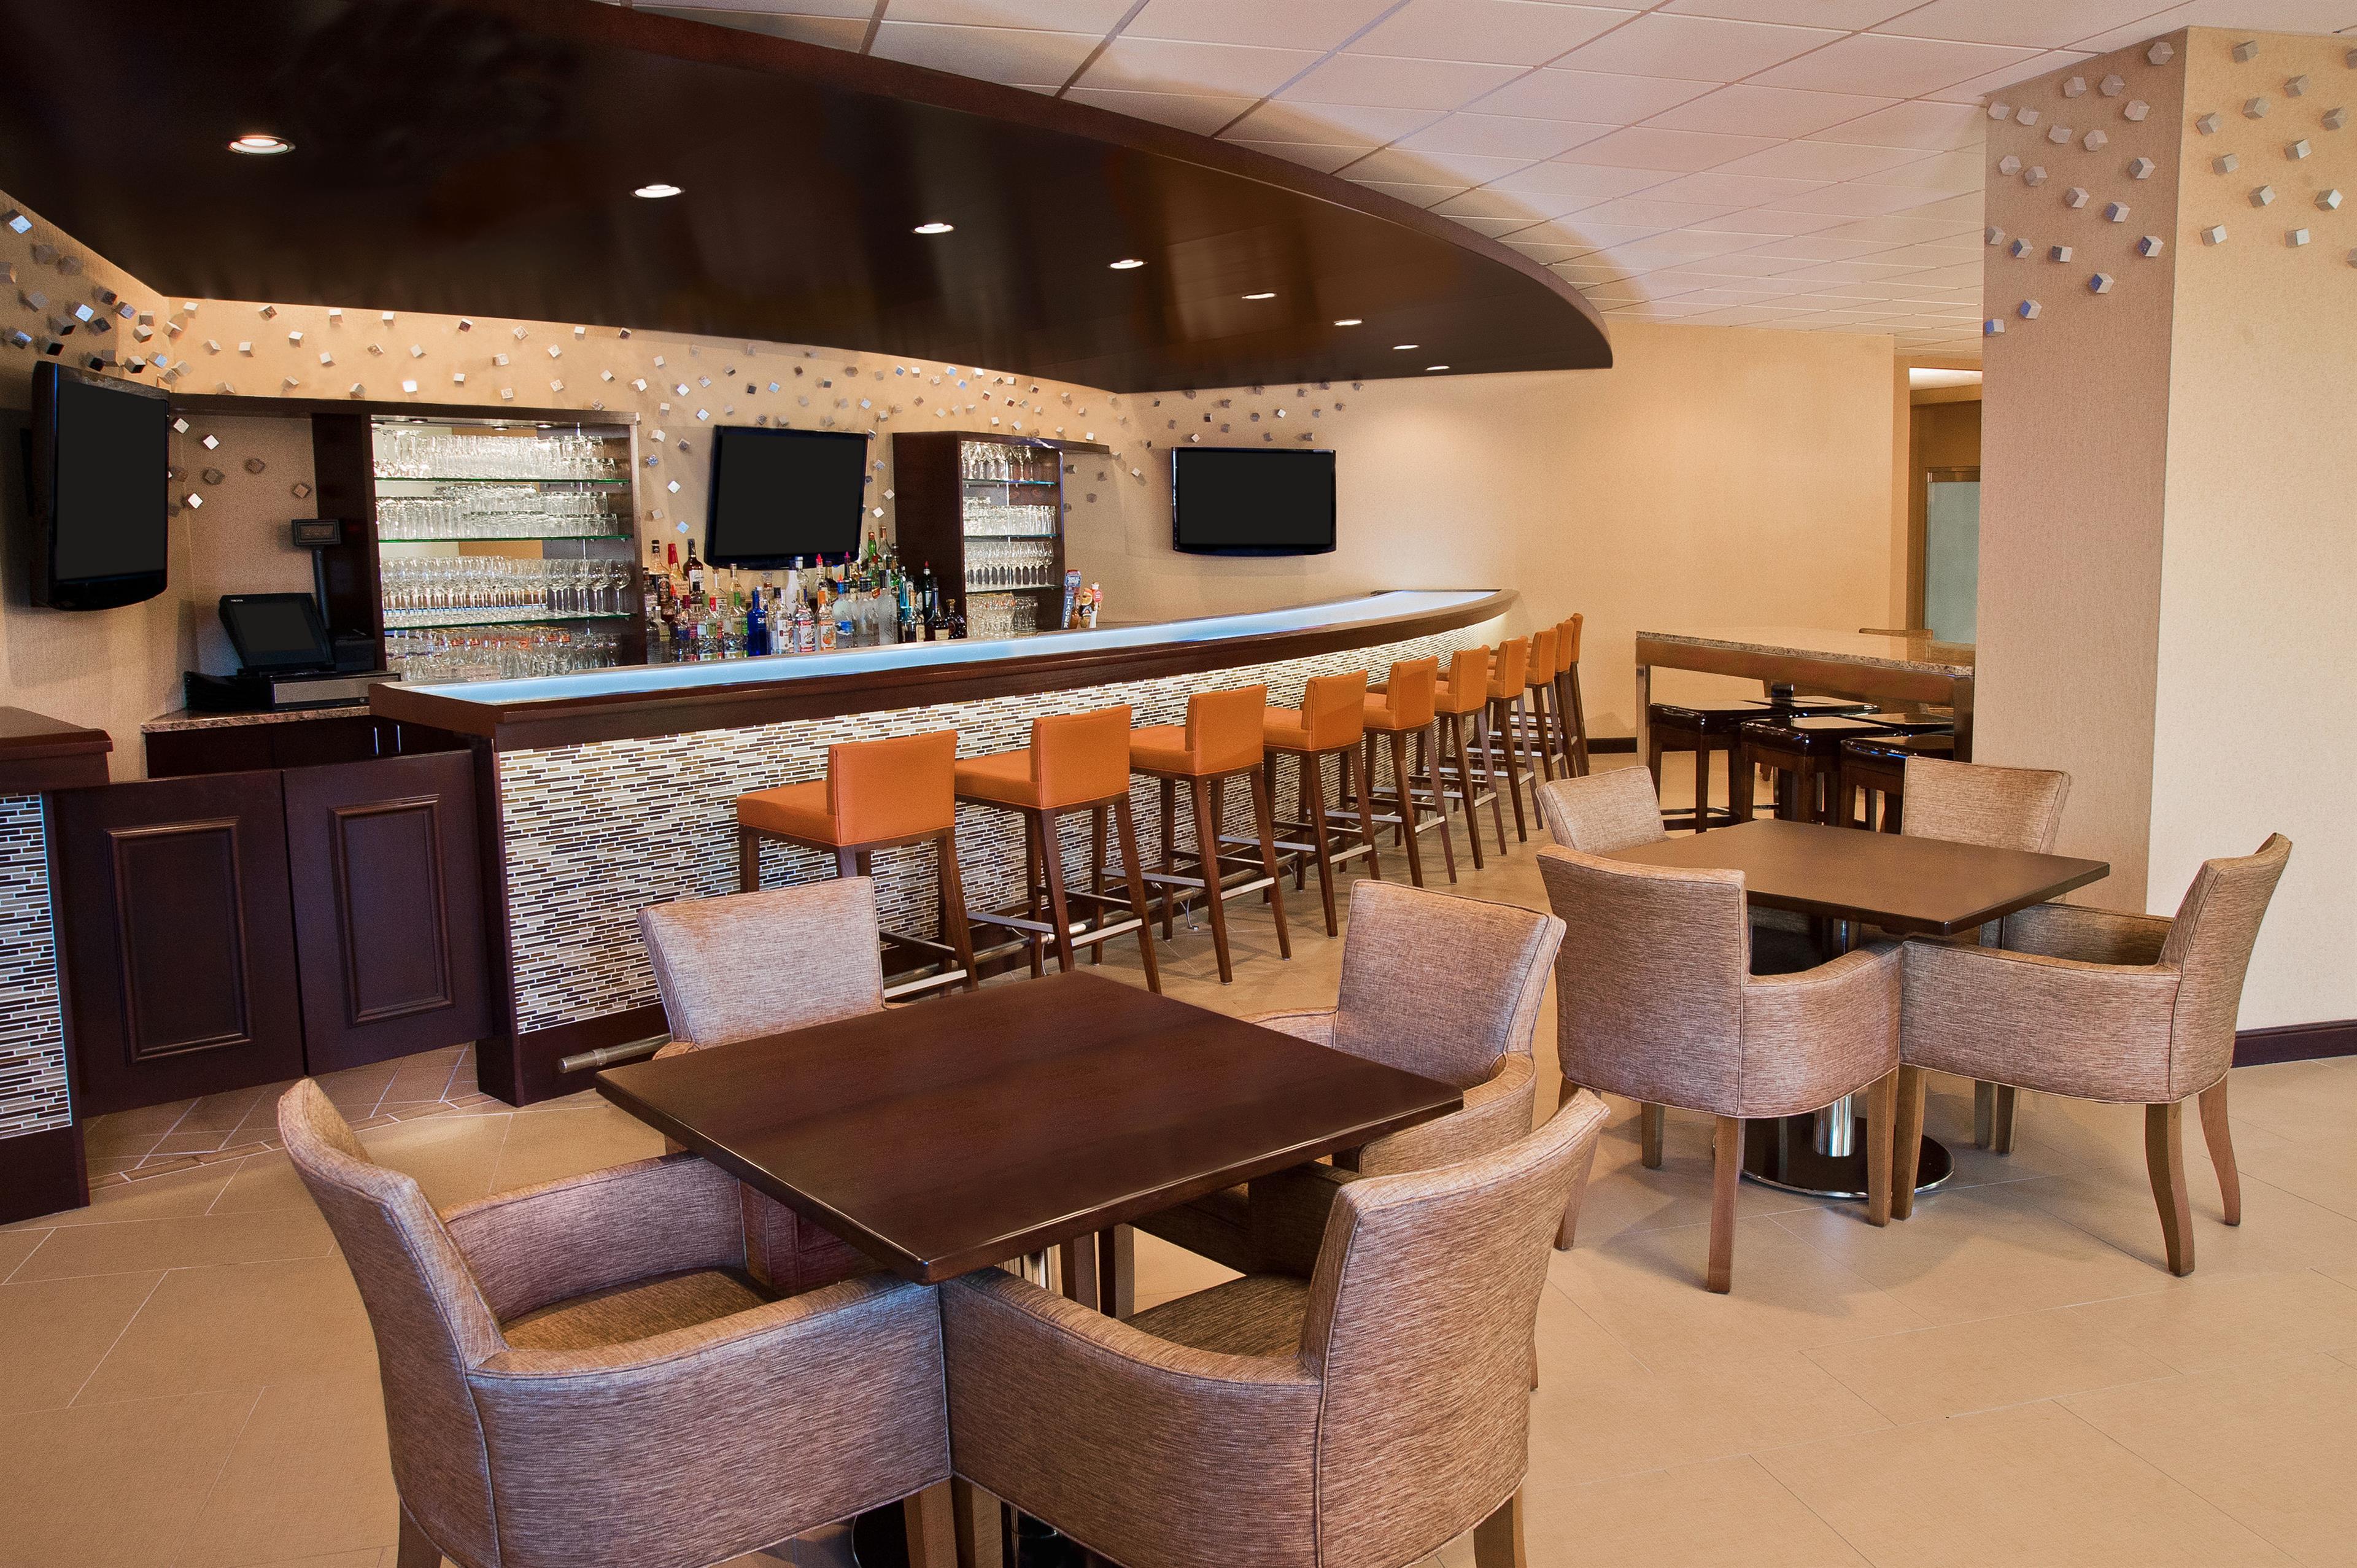 Sheraton Westport Plaza Hotel St. Louis image 5